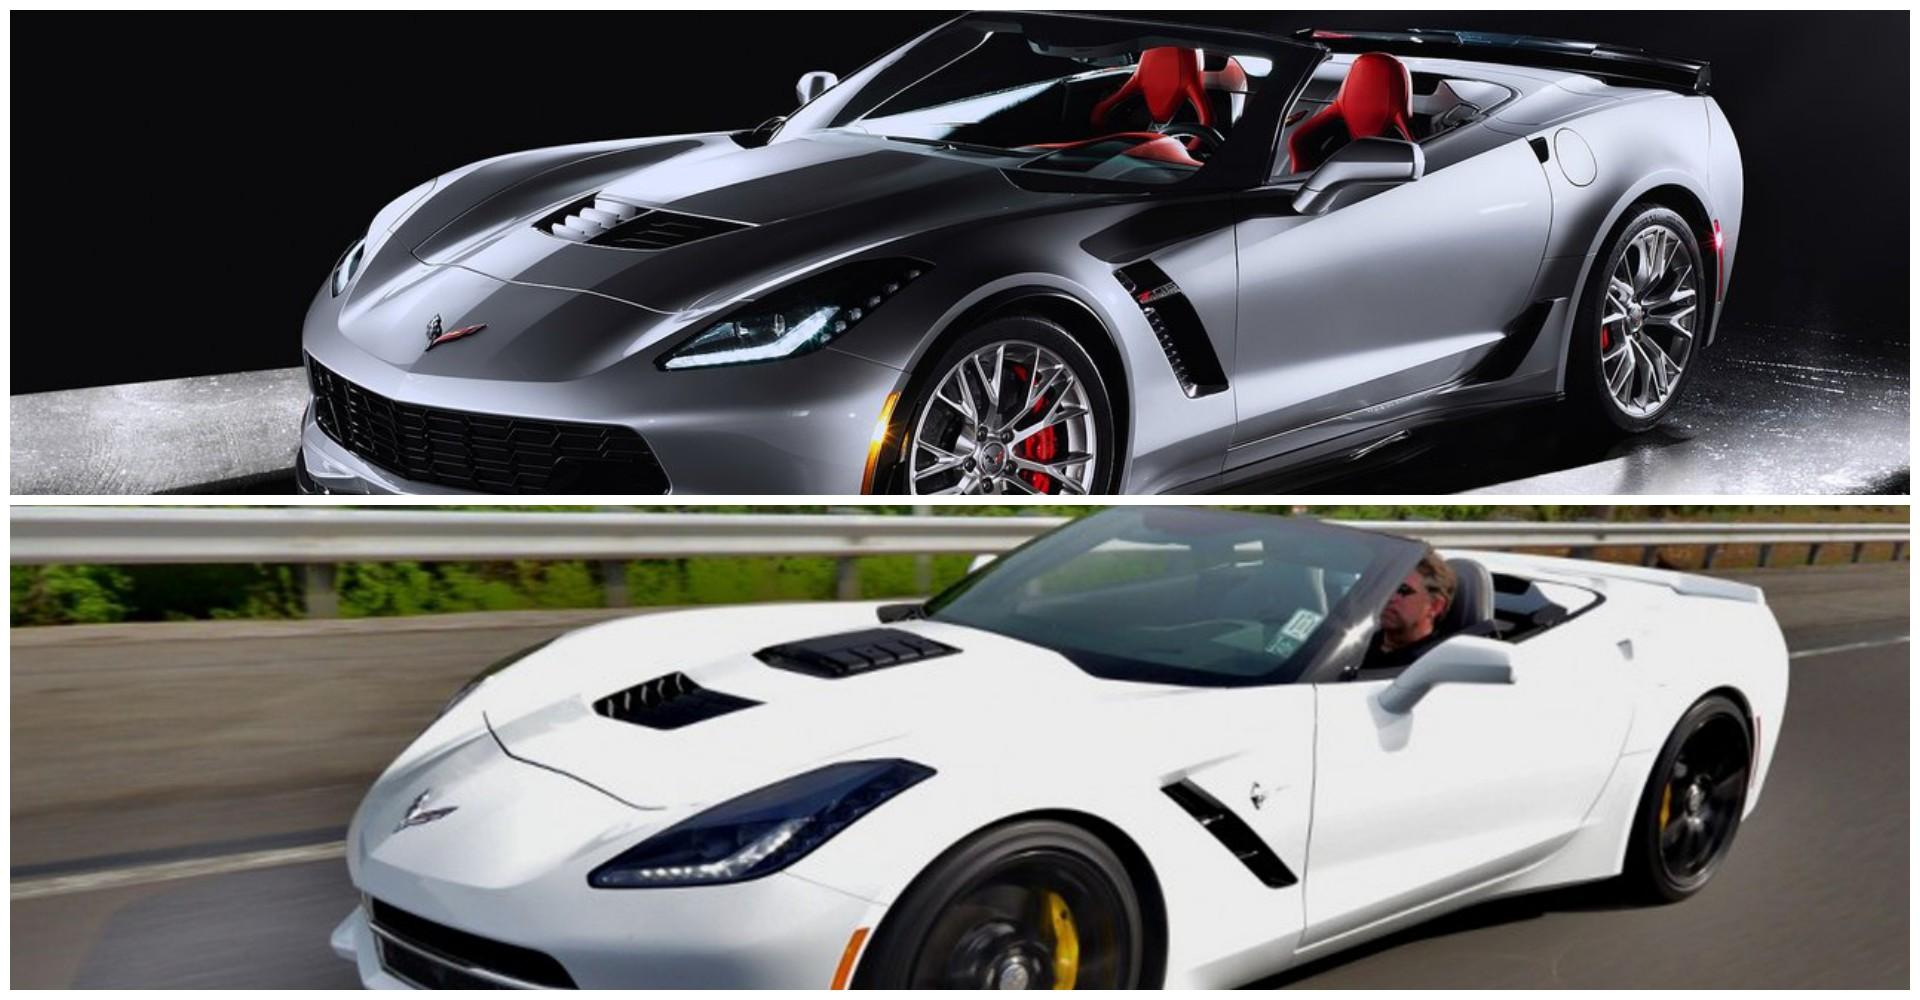 2015 Chevrolet Corvette Z06 vs 2014 Callaway Corvette SC627 - Which